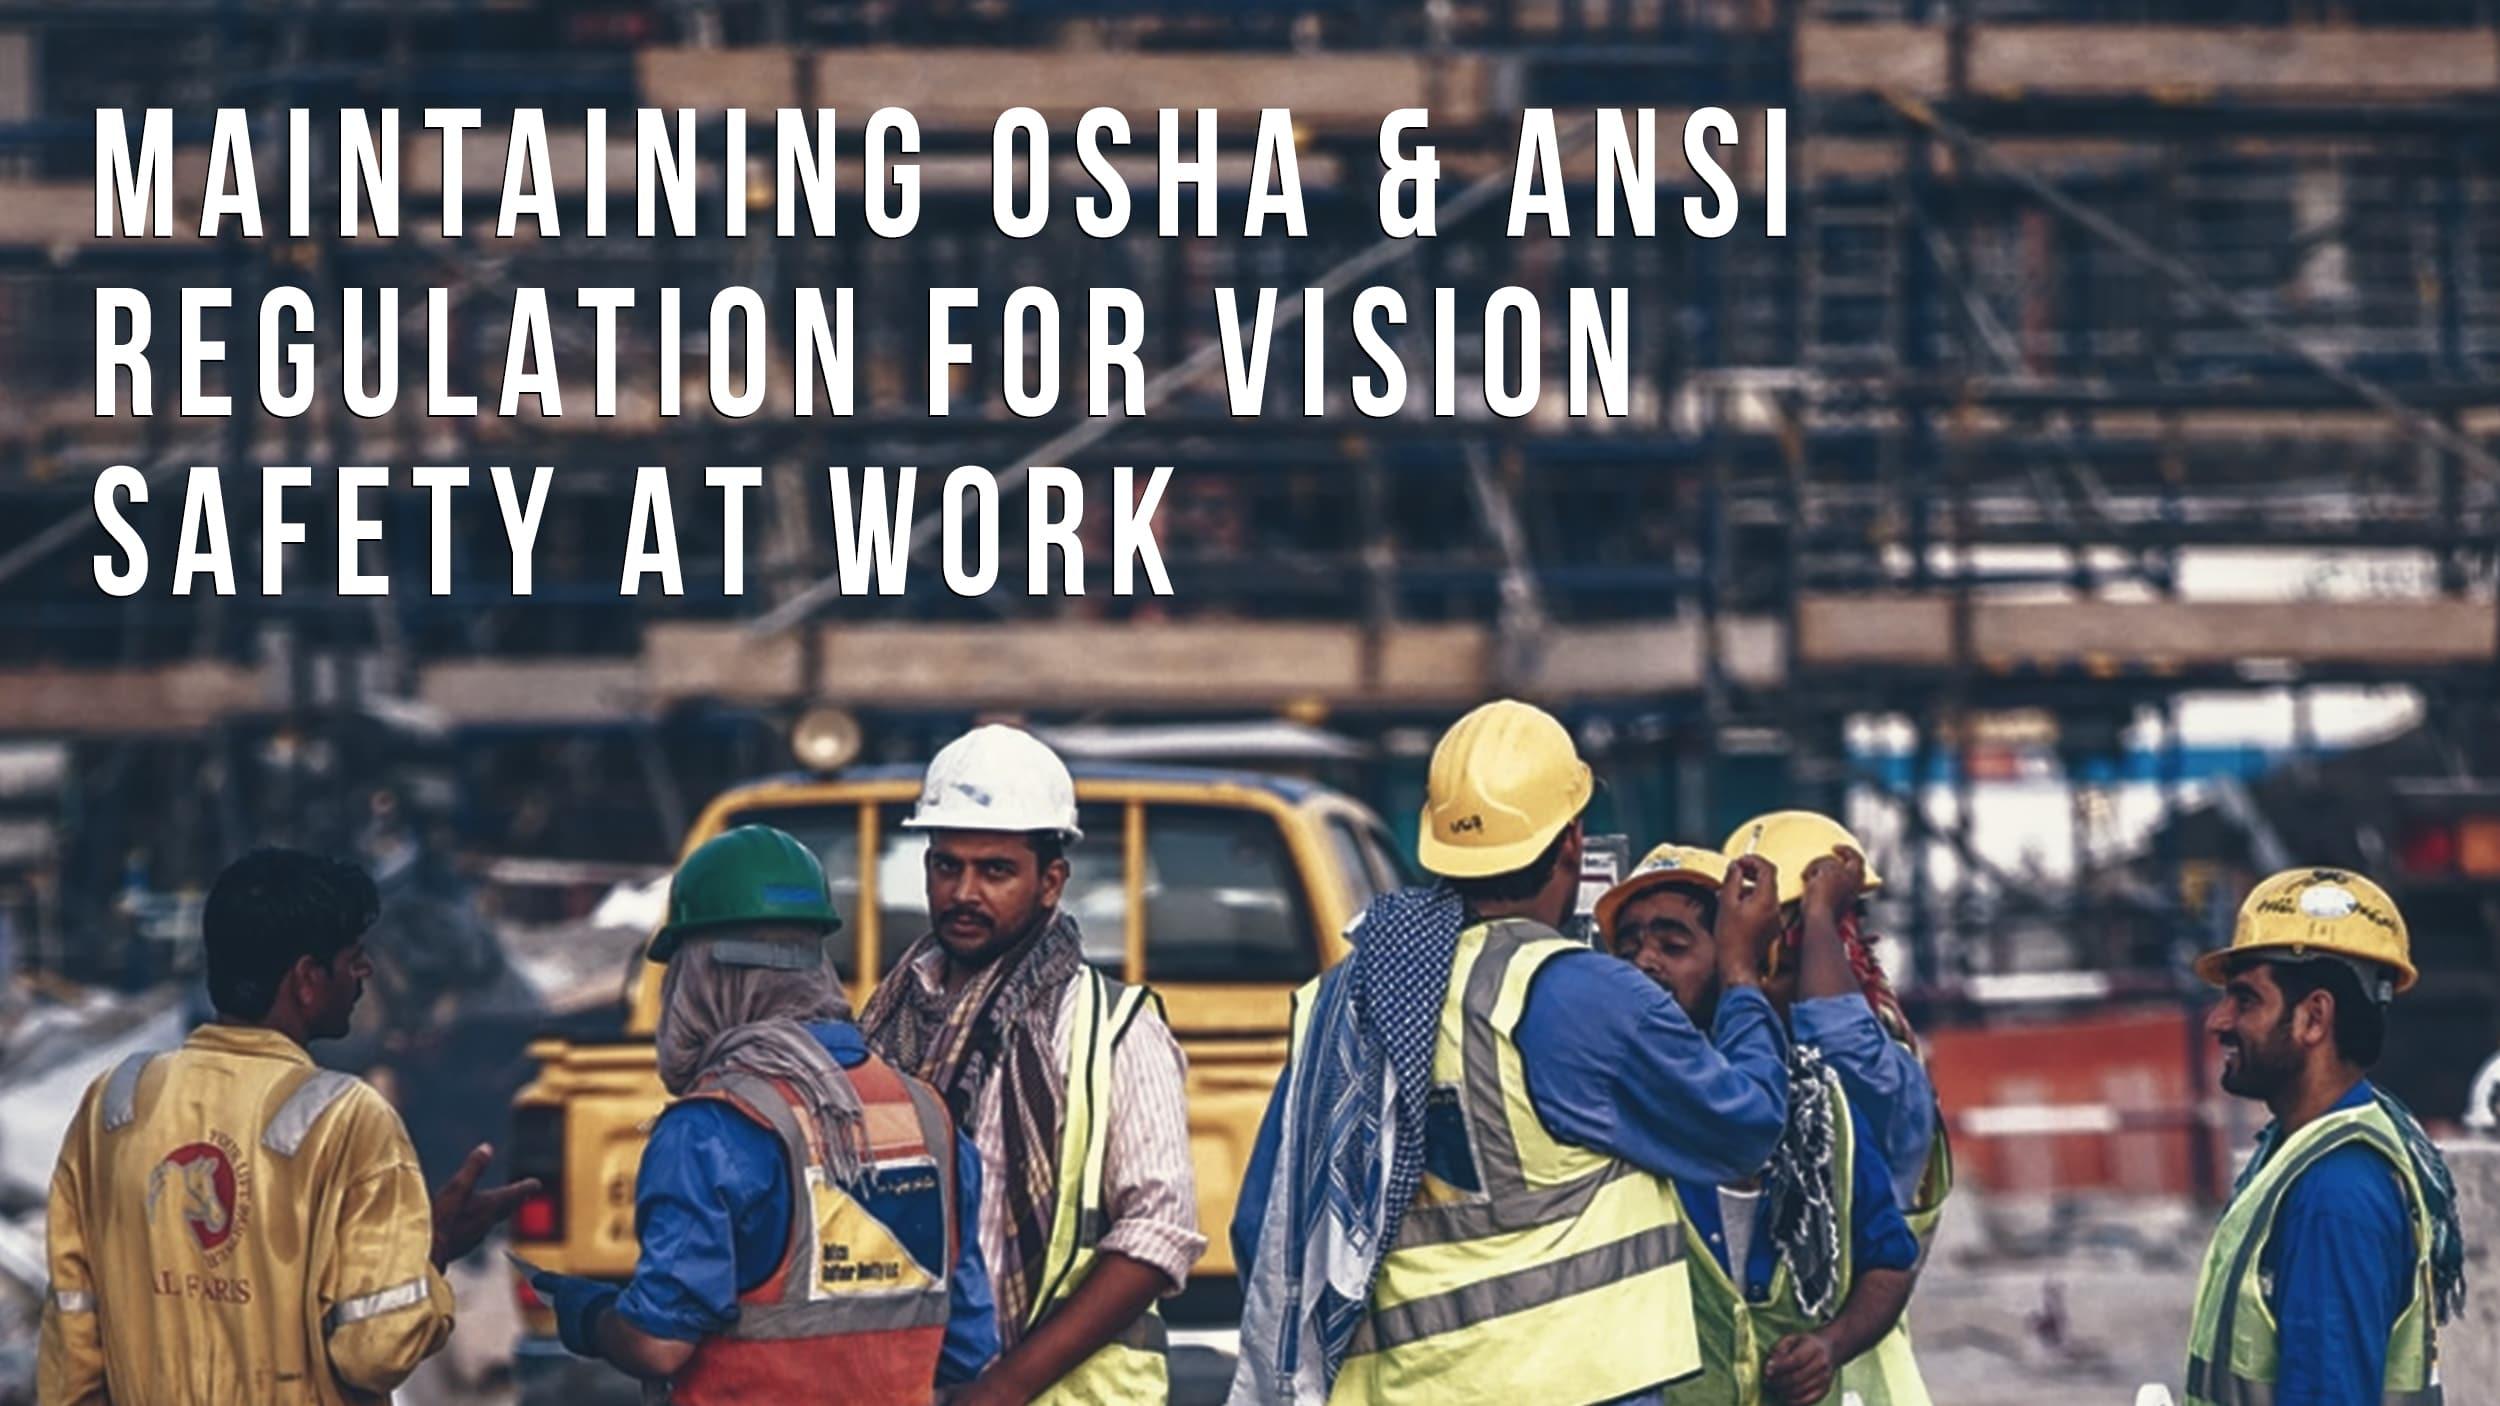 Maintaining OSHA & ANSI Regulation For Vision Safety At Work Header